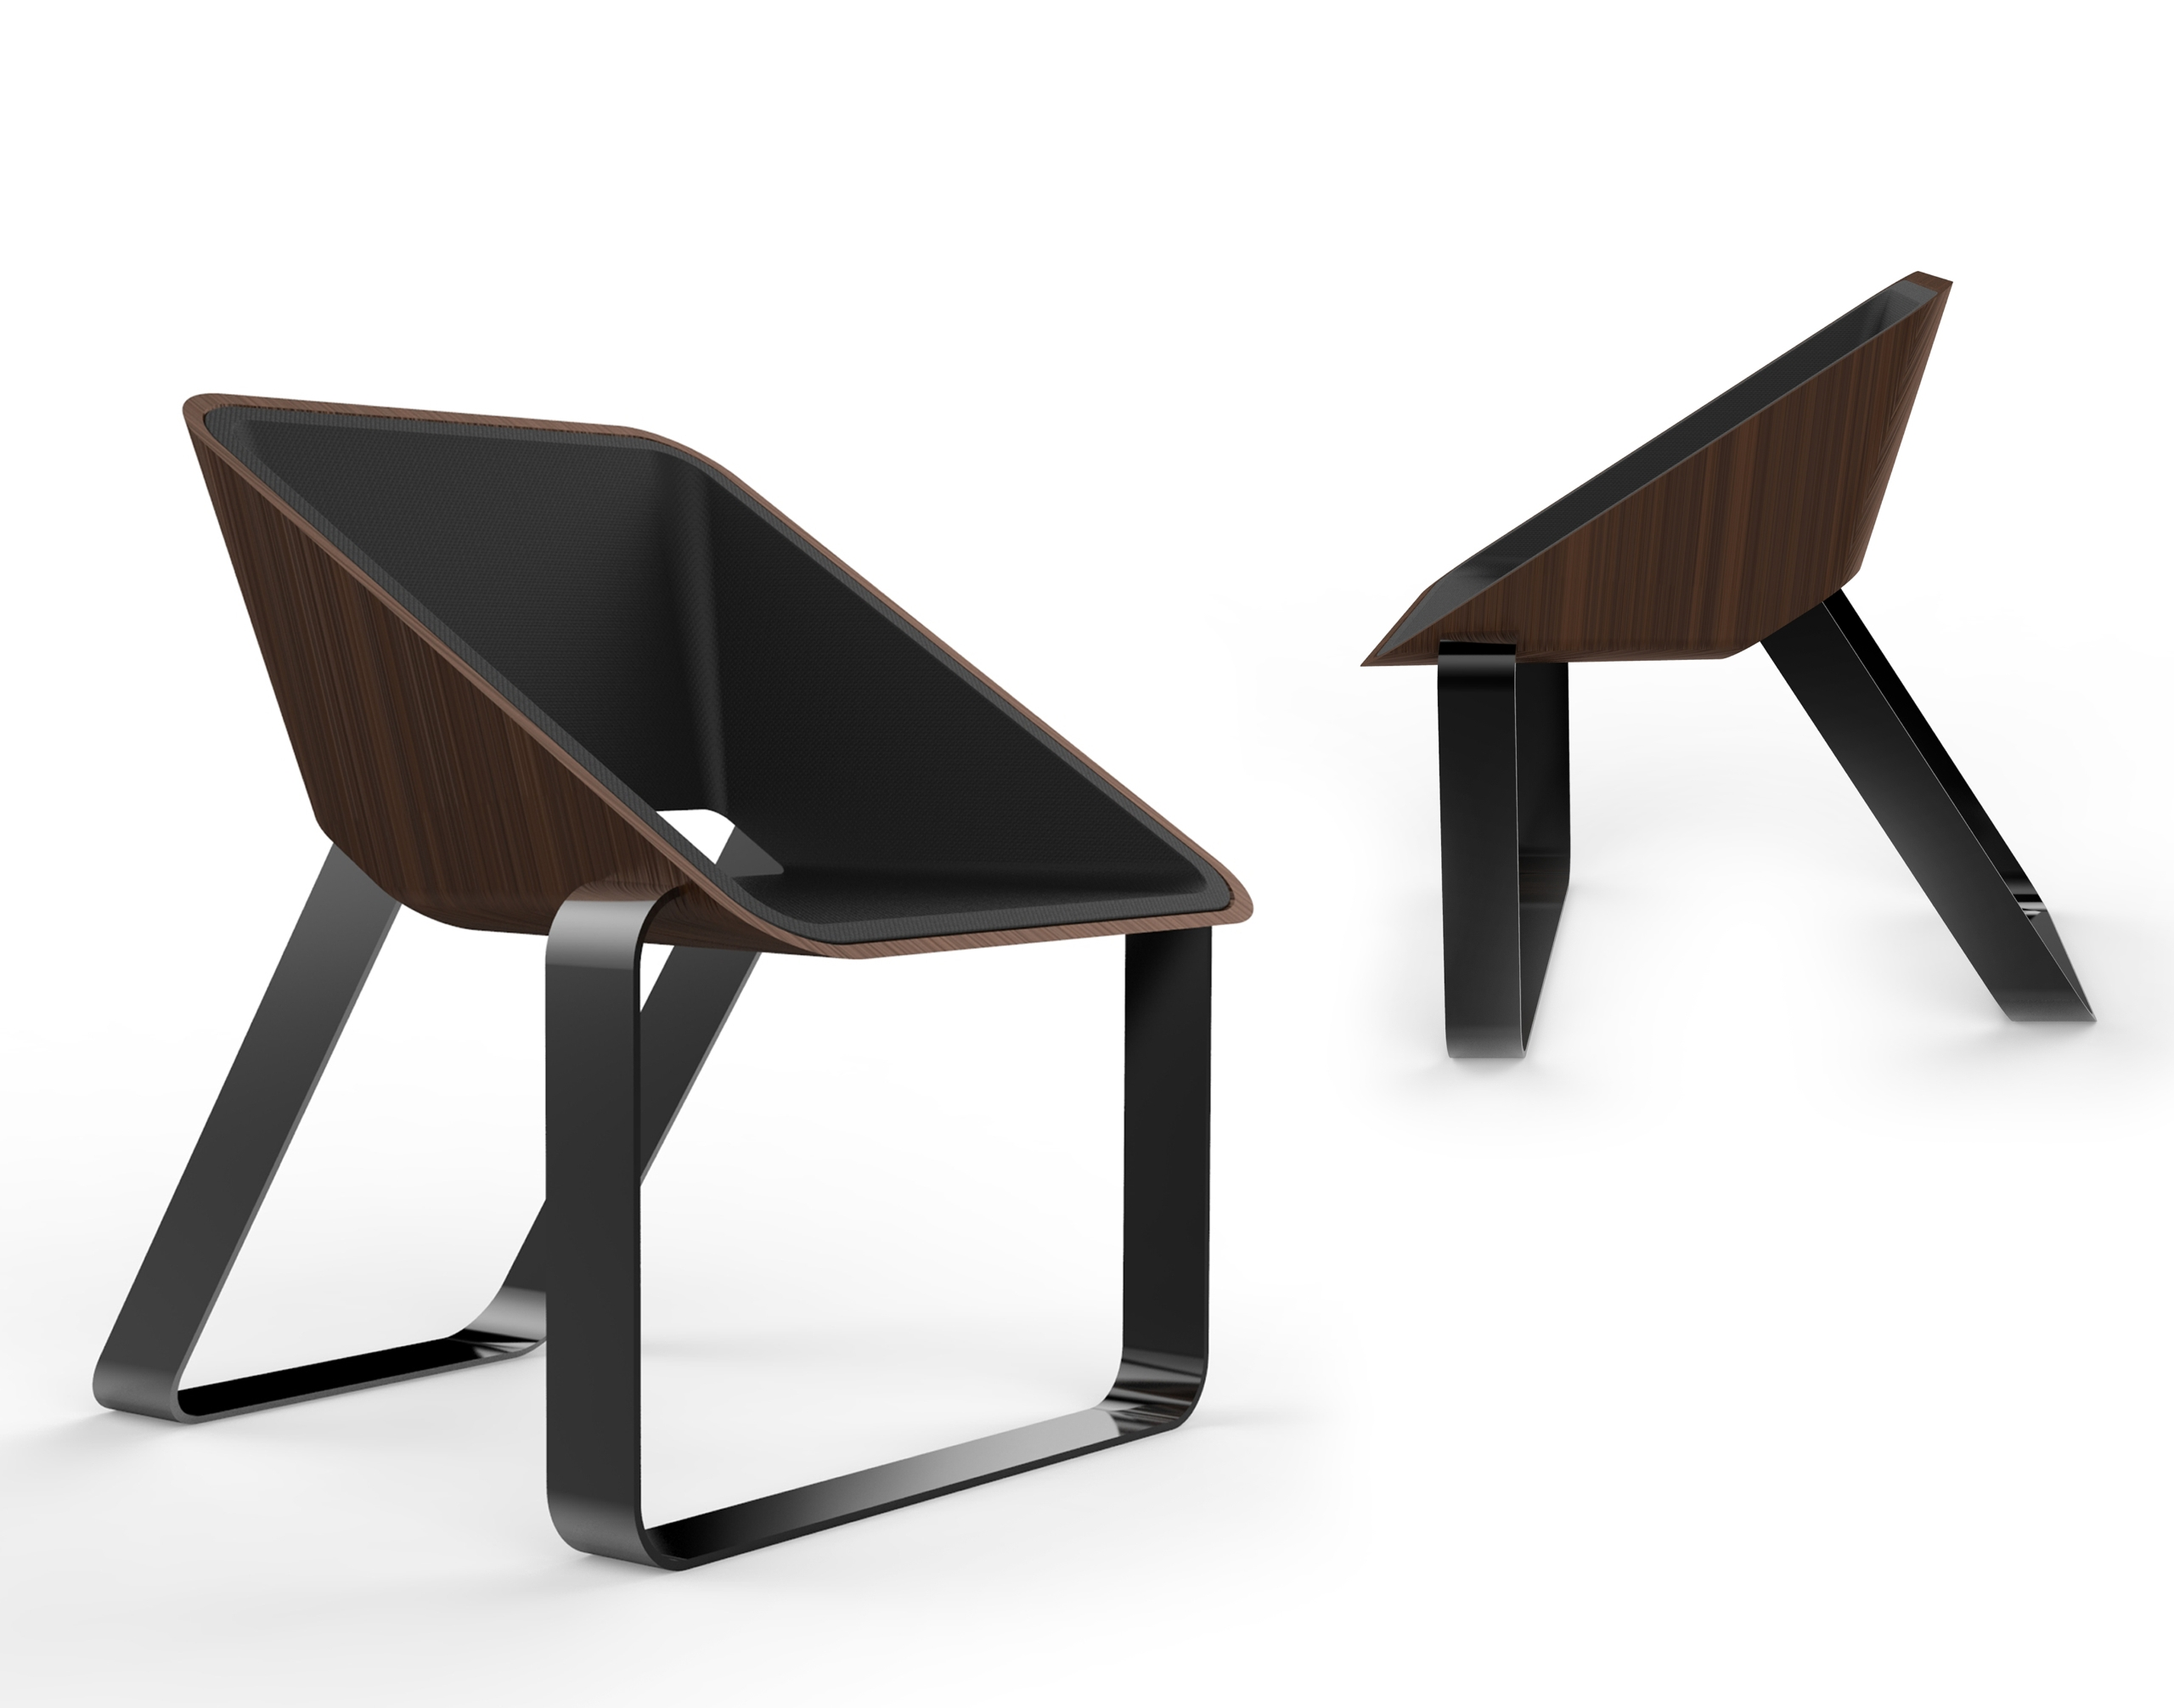 Lunar Lander lounge chair conce - jamesowendesign | ello